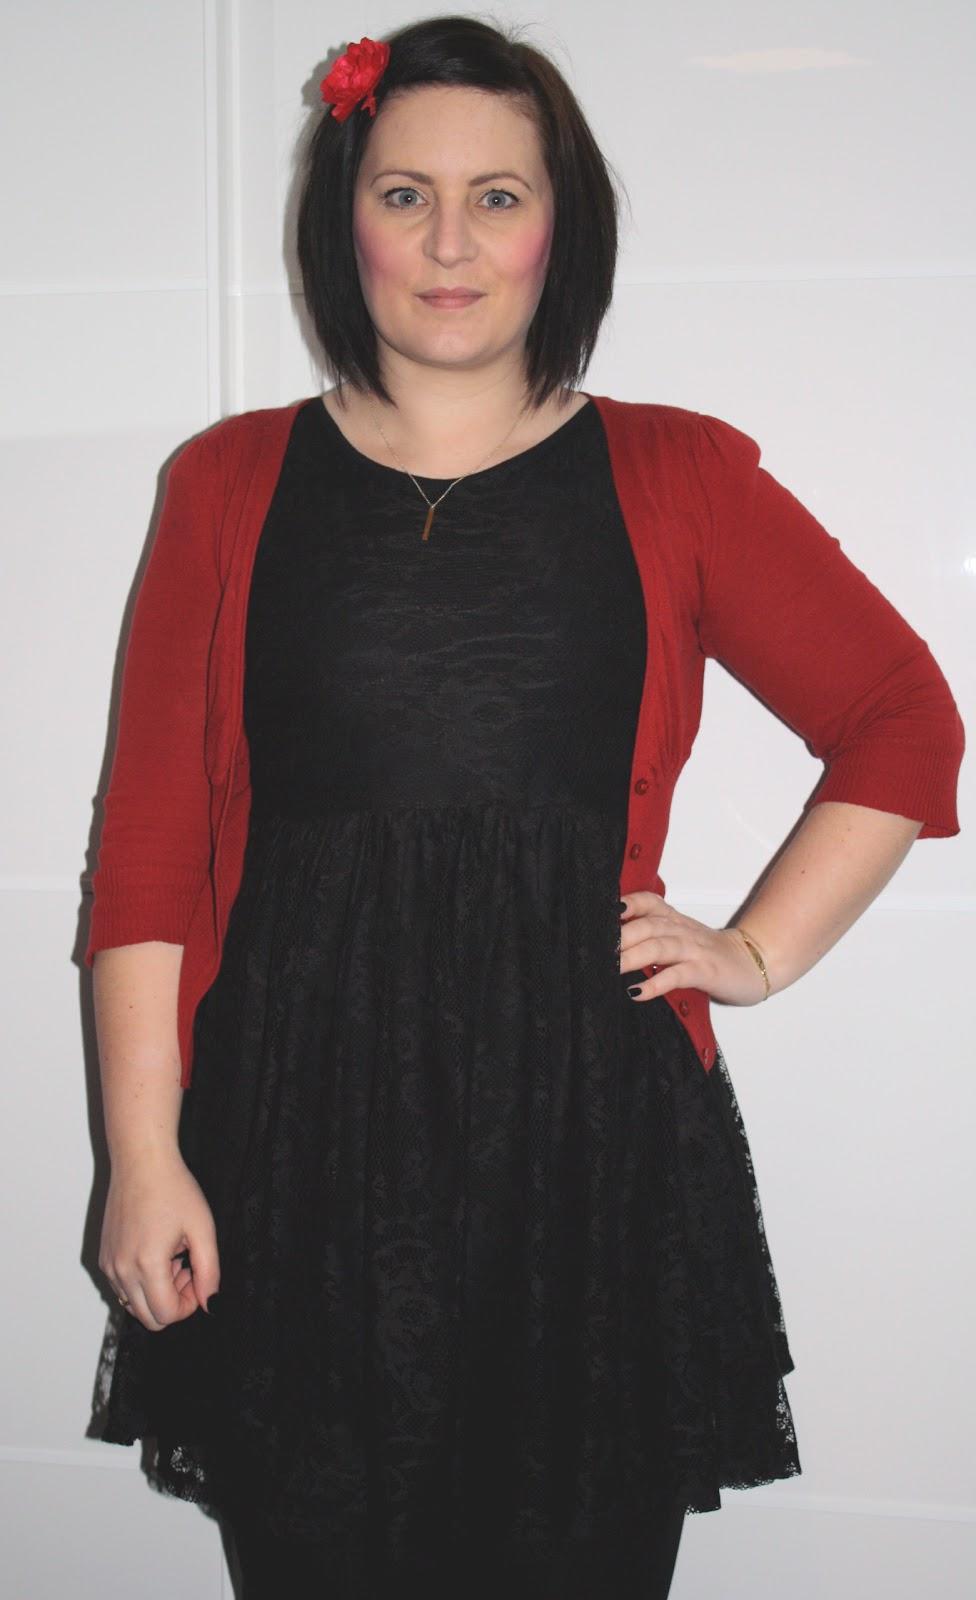 a million dresses | UK Fashion and Lifestyle Blog: Red Alert!